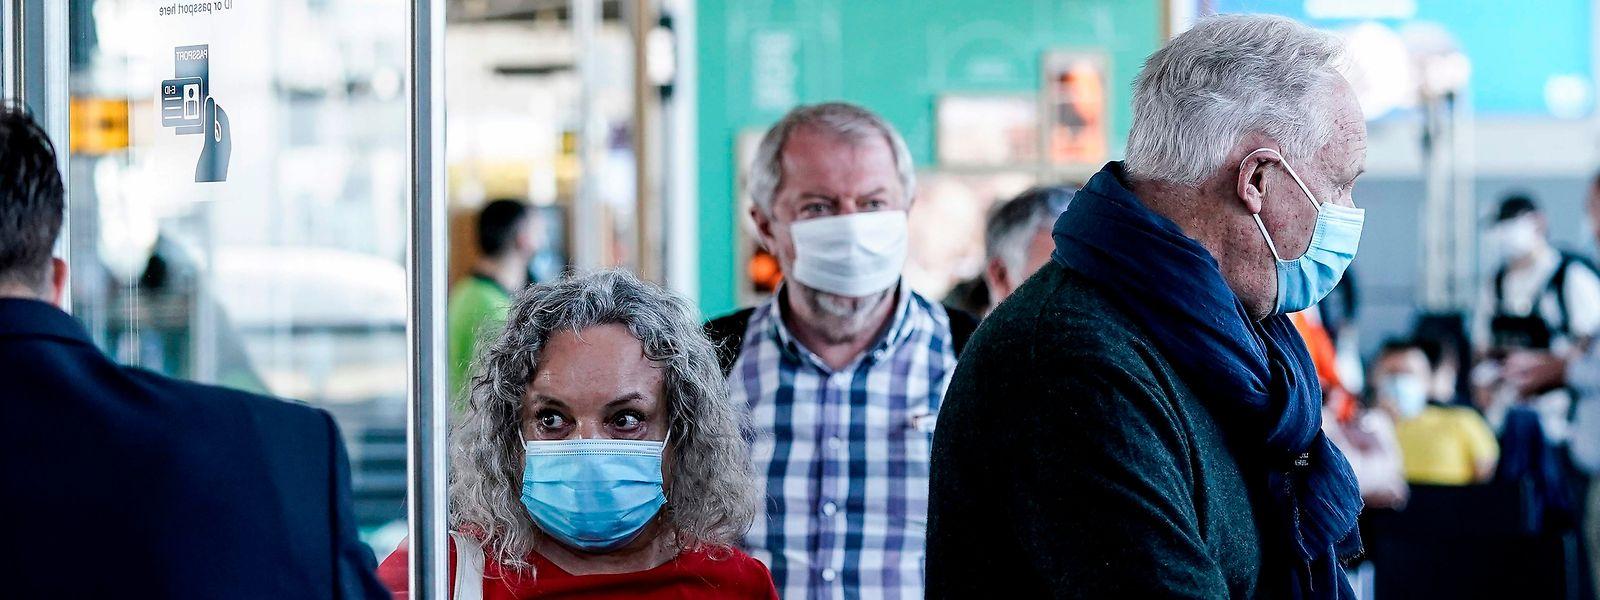 Avrox a fourni aux autorités belges 15 millions de masques en tissu.